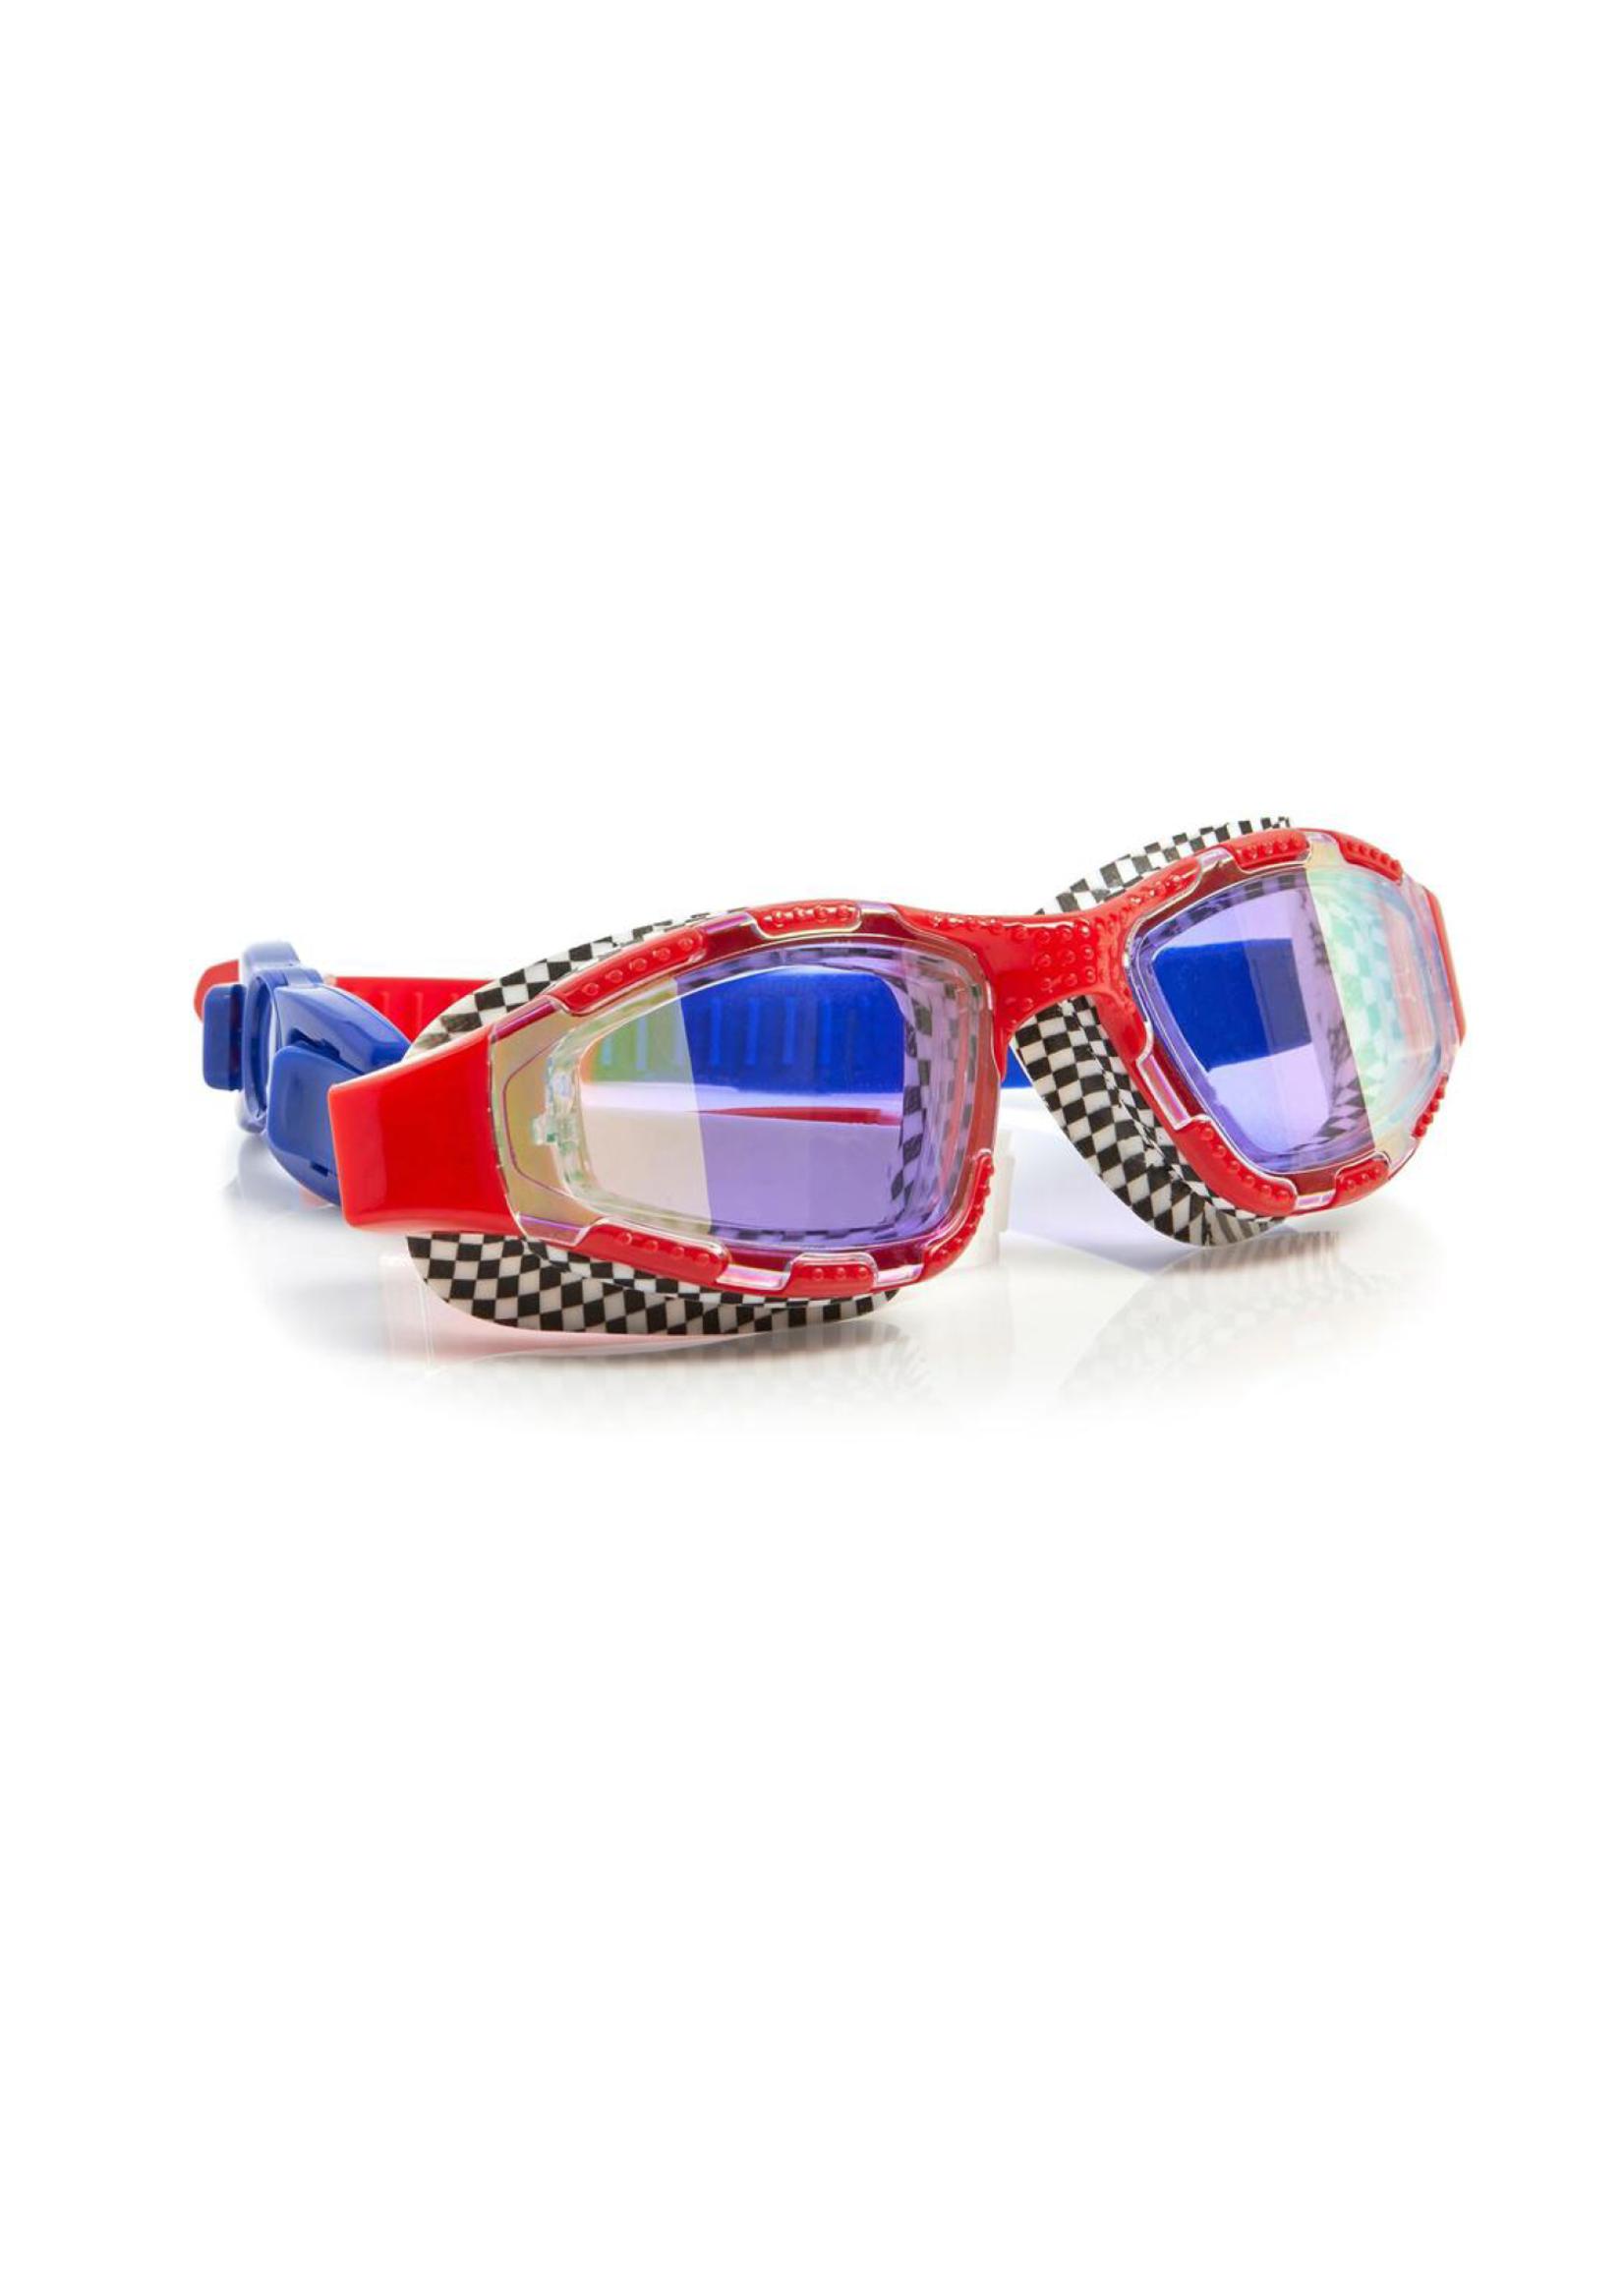 Bling2o Street Vibe Goggles